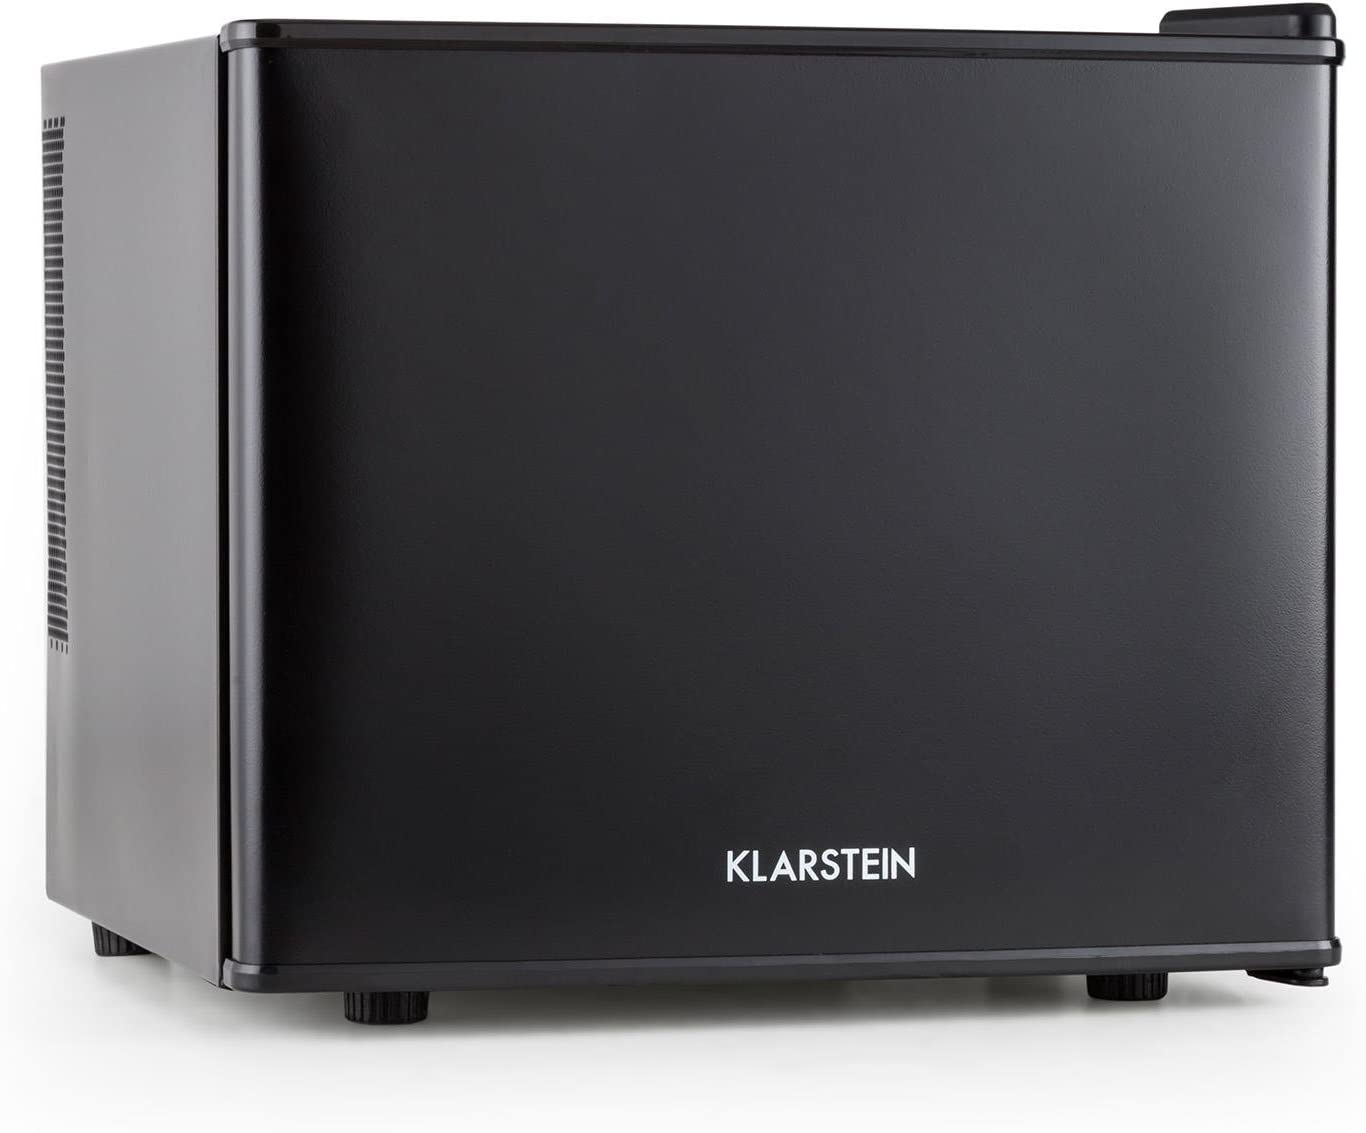 Klarstein Geheimversteck - Minibar, Mini nevera, Nevera para bebidas, Clase A+, 17 Litros, 38,5 x 33,5 x 41,5 cm, Silenciosa, Regulador de temperatura continuo, Ahorro de espacio, Negro